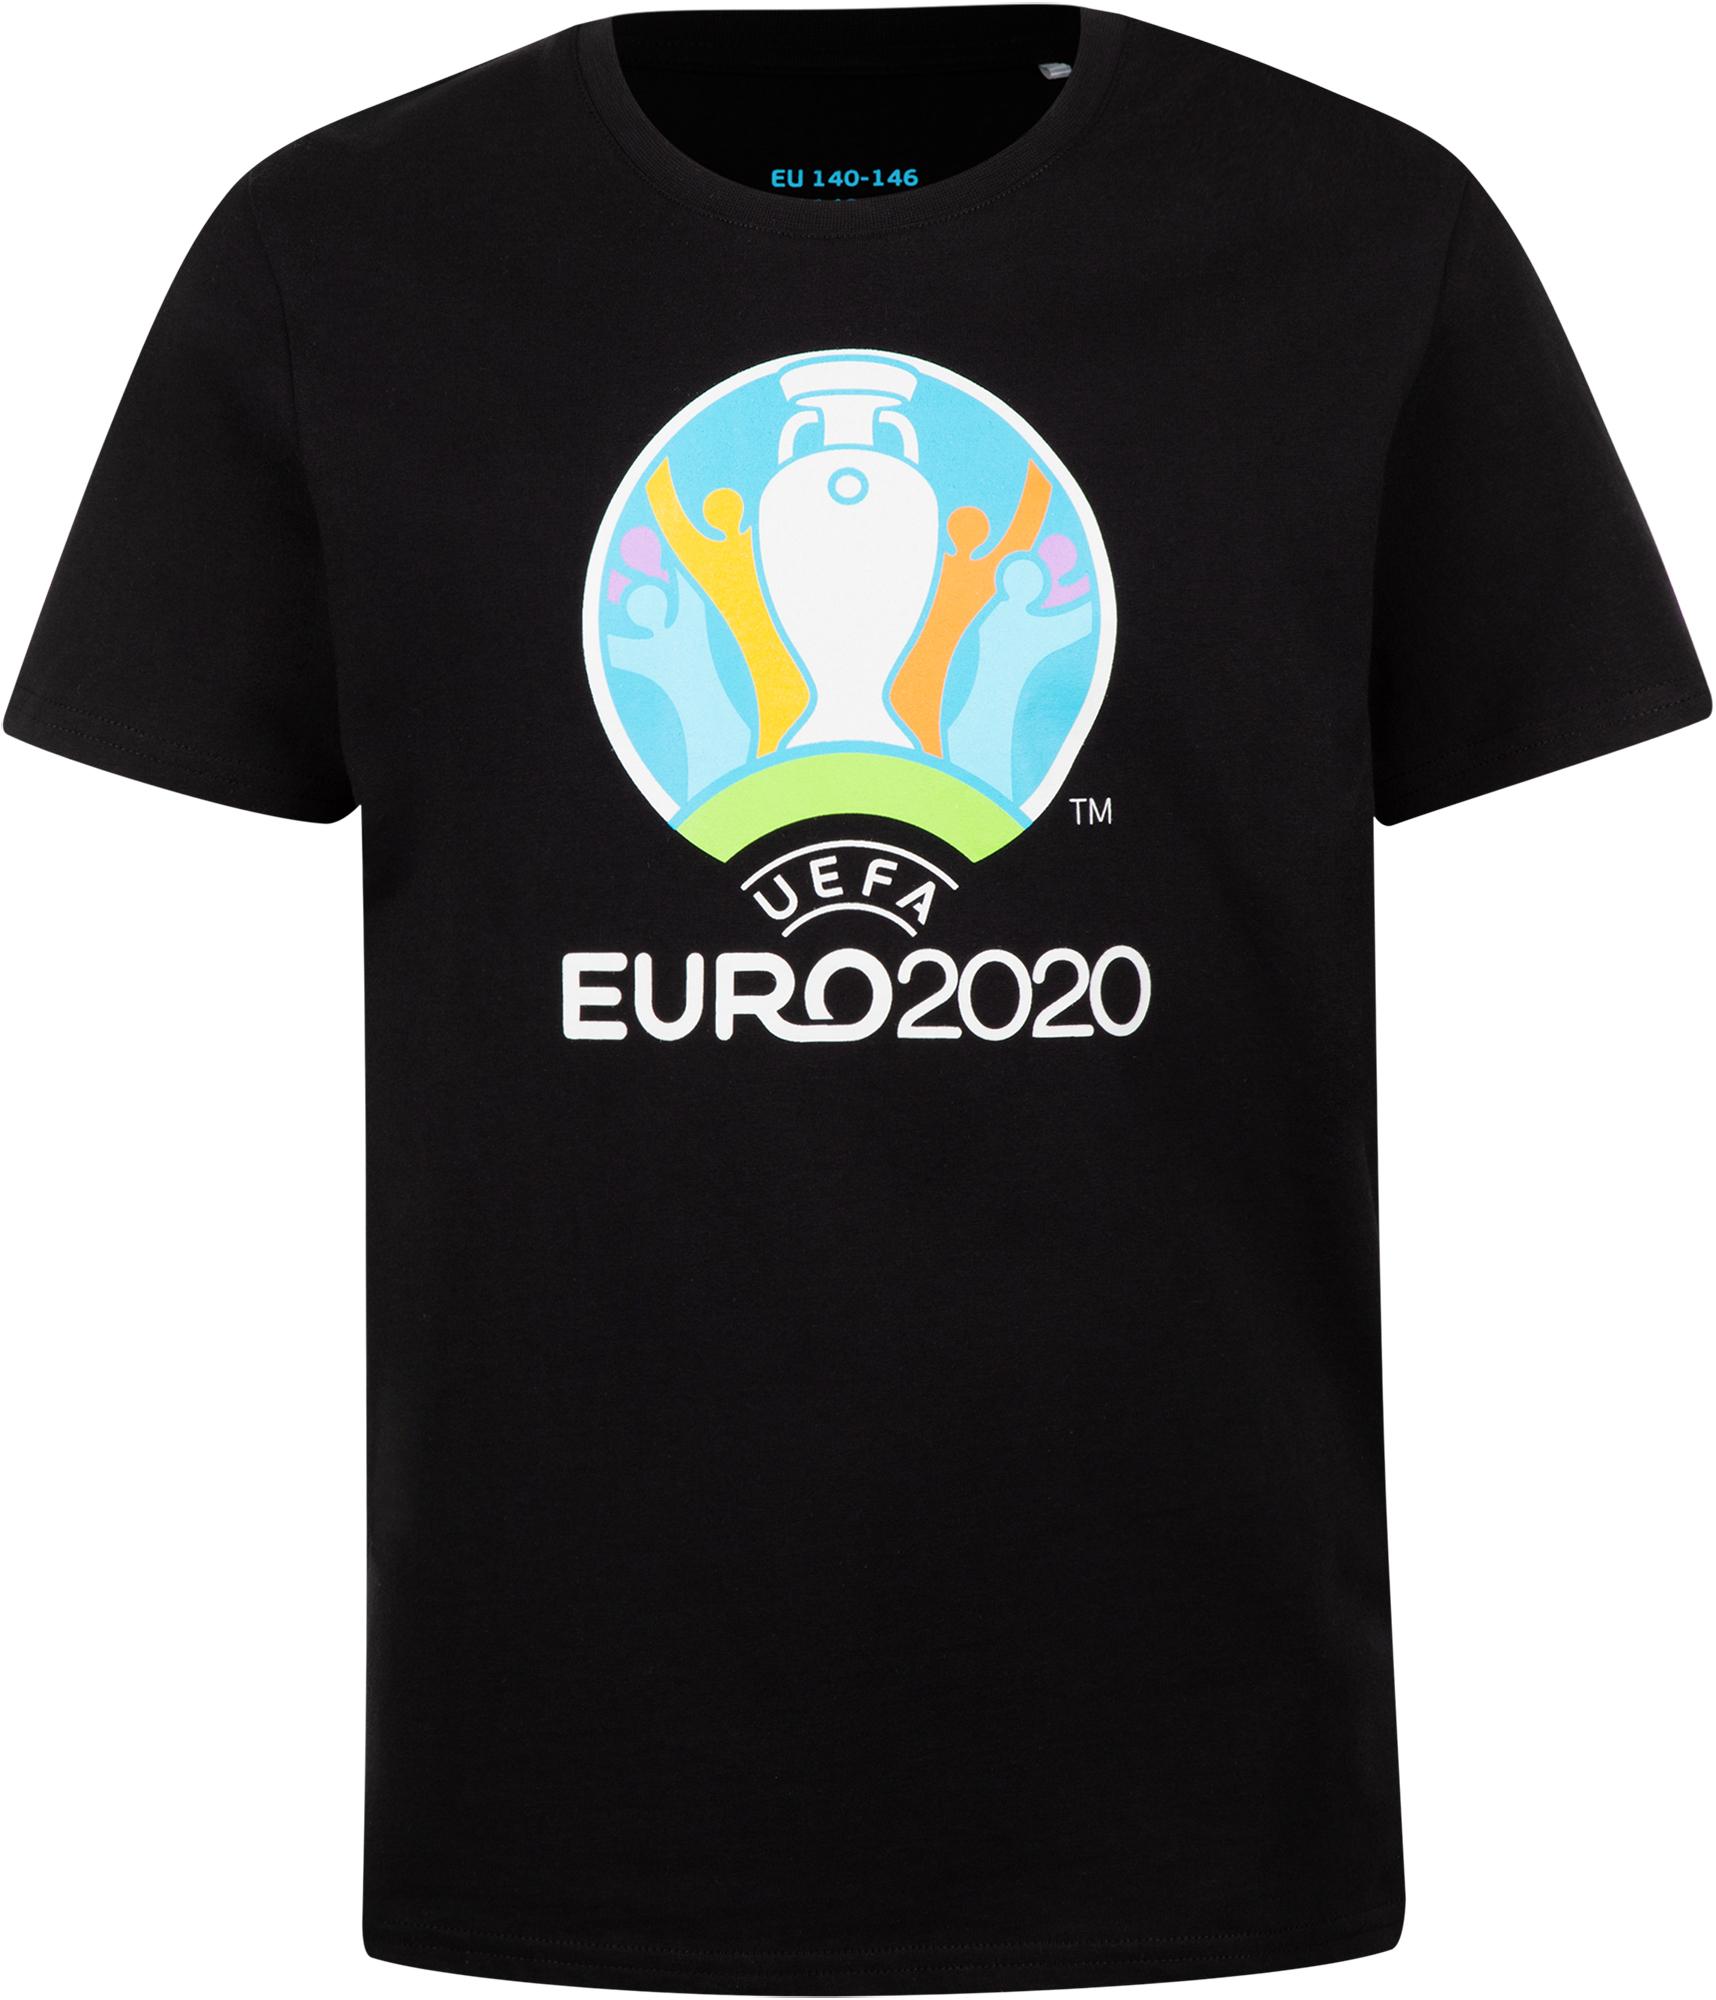 UEFA EURO 2020 Футболка для мальчиков UEFA EURO 2020, размер 116 подушка printio uefa euro 2016